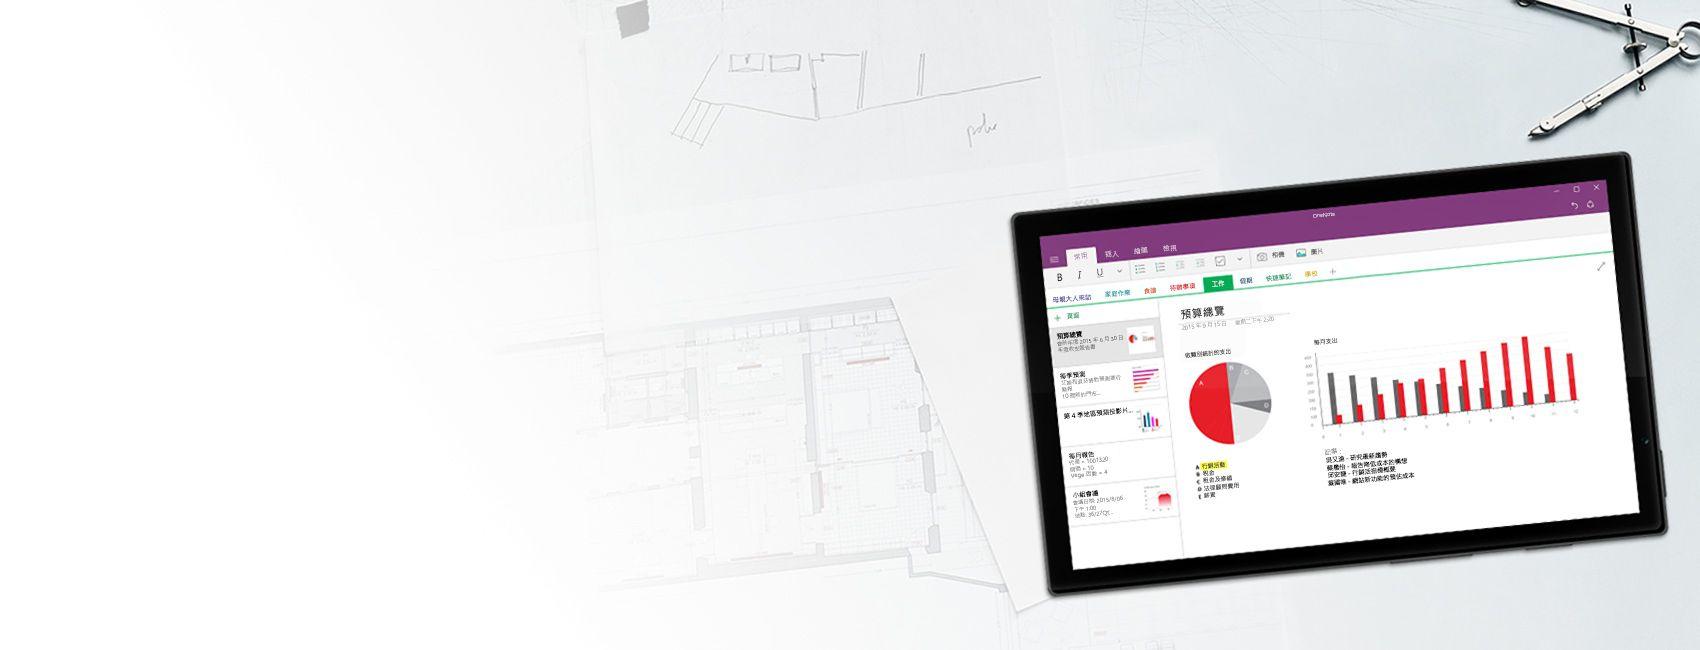 Windows 平板電腦顯示一份有預算概觀圖表的 OneNote 筆記本